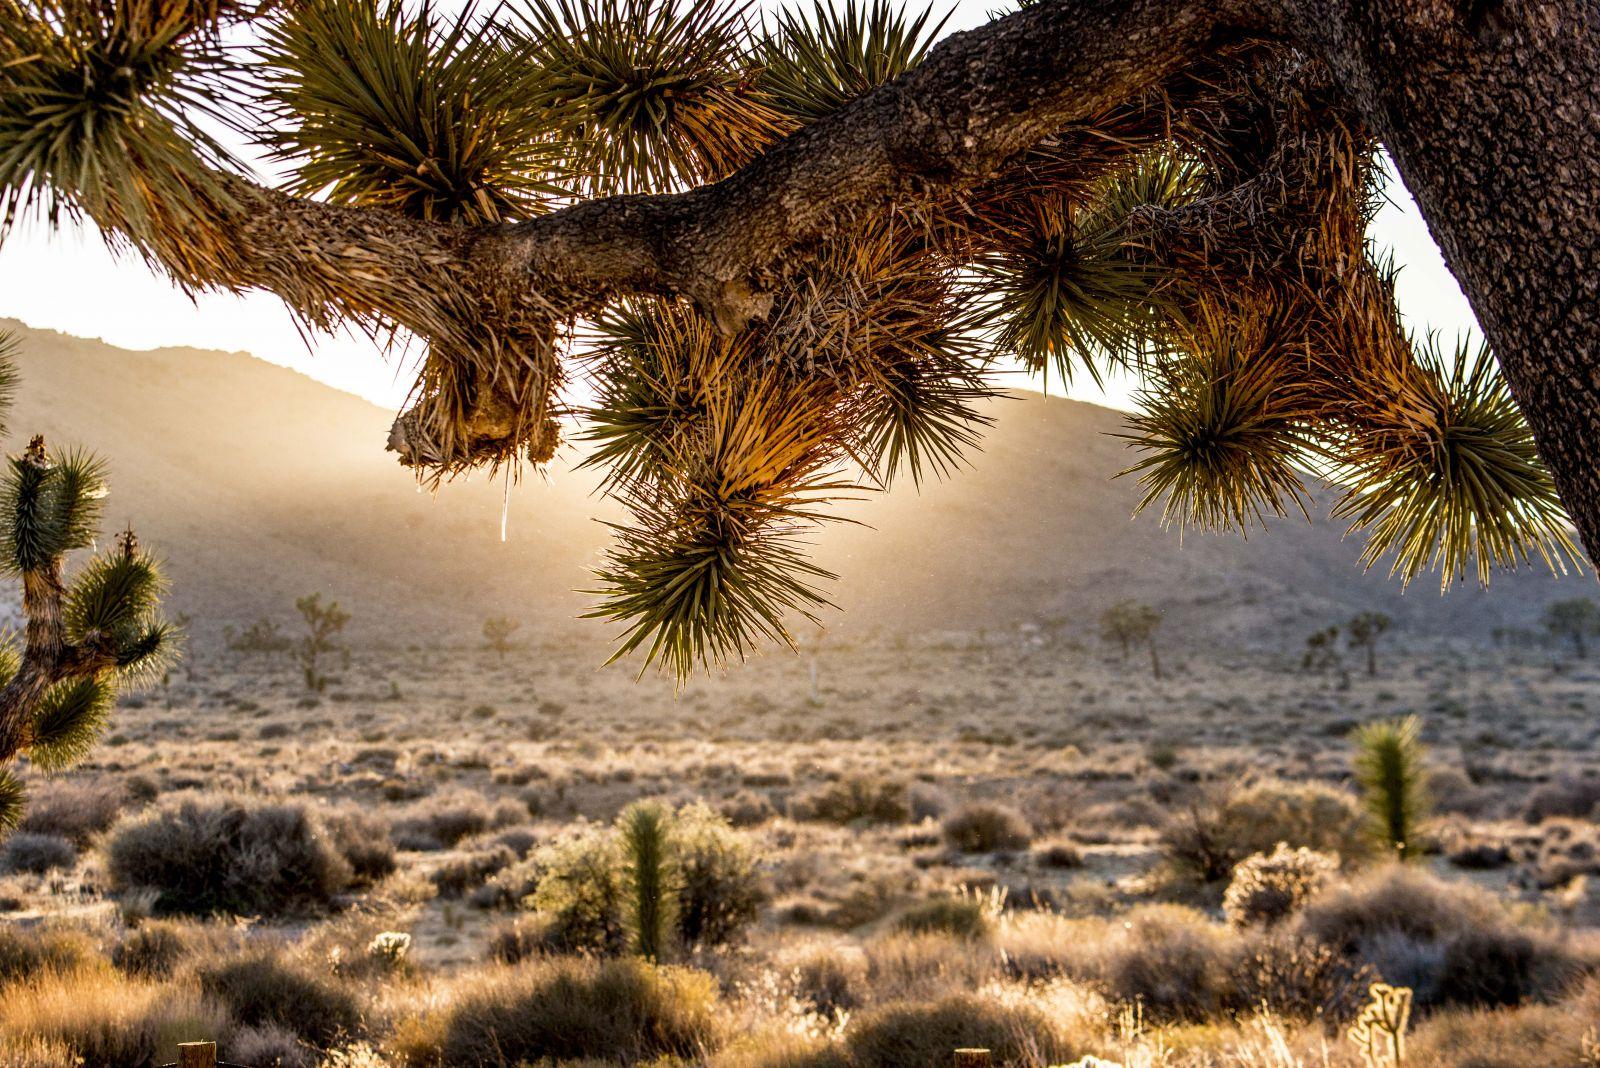 Sunset in Joshua Tree National Park